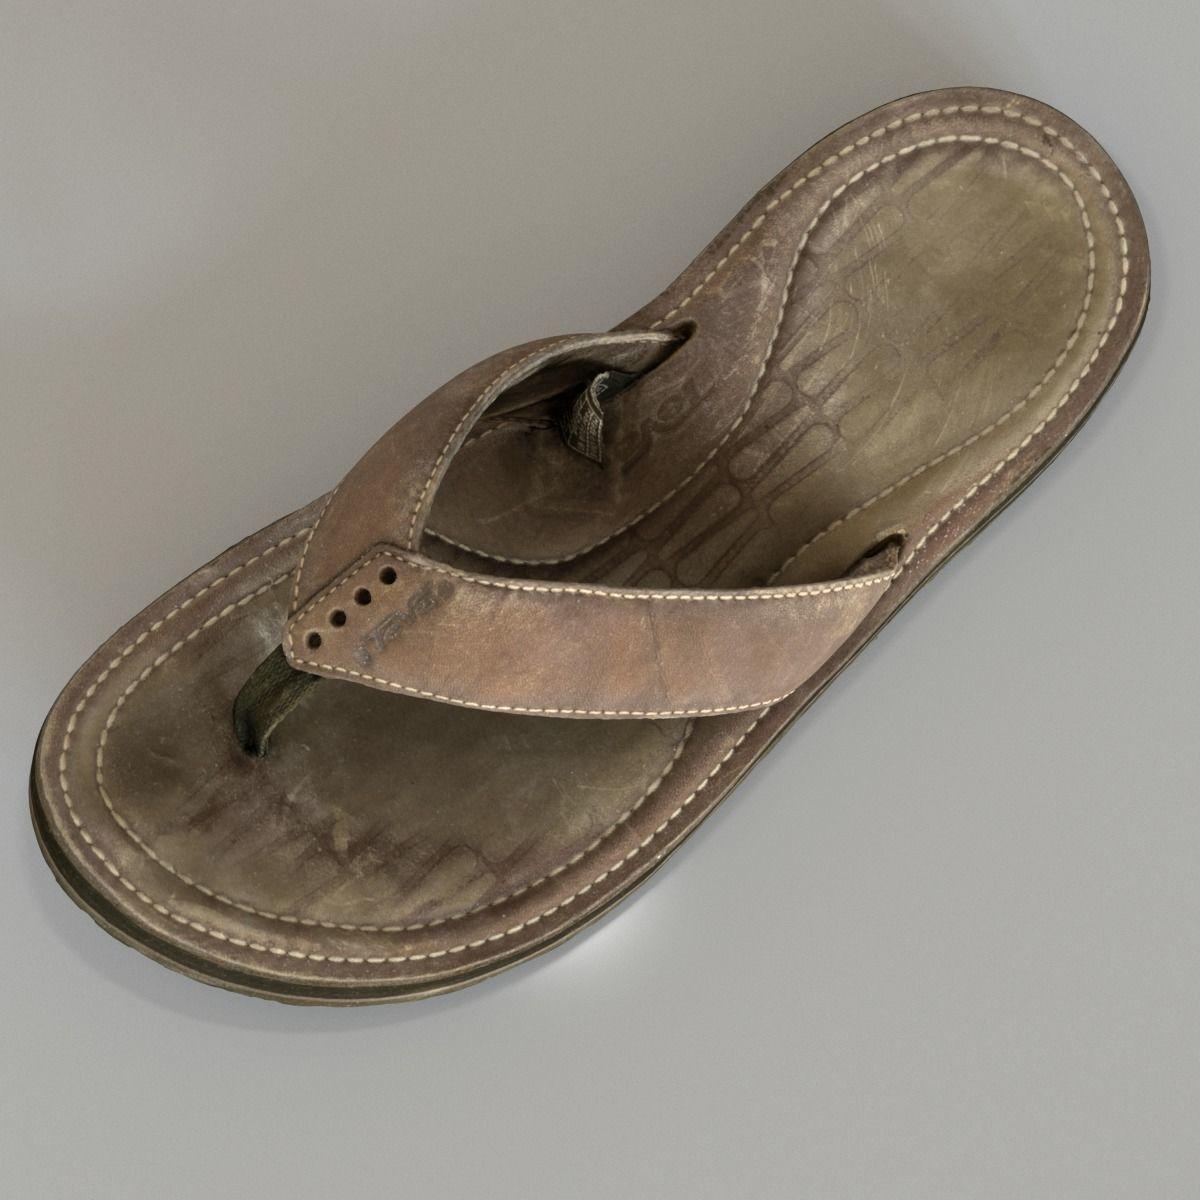 c0be2475bd2490 ... old teva sandal 3d model max fbx c4d ma mb 5 ...